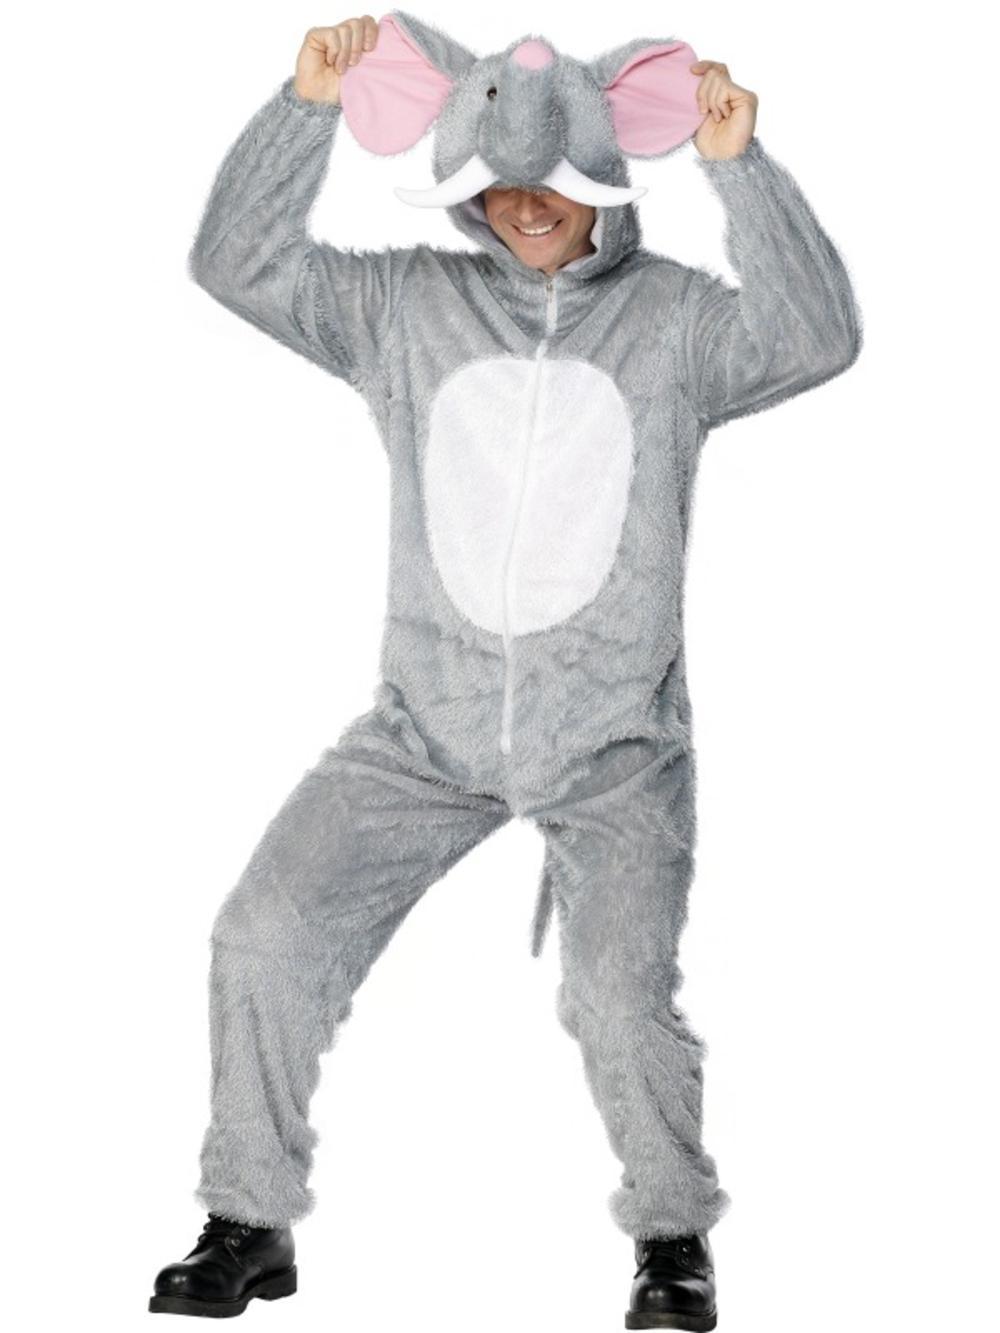 Elephant Fancy Dress Jungle Animal Party Mens Ladies Adult Costume Outfit M/L